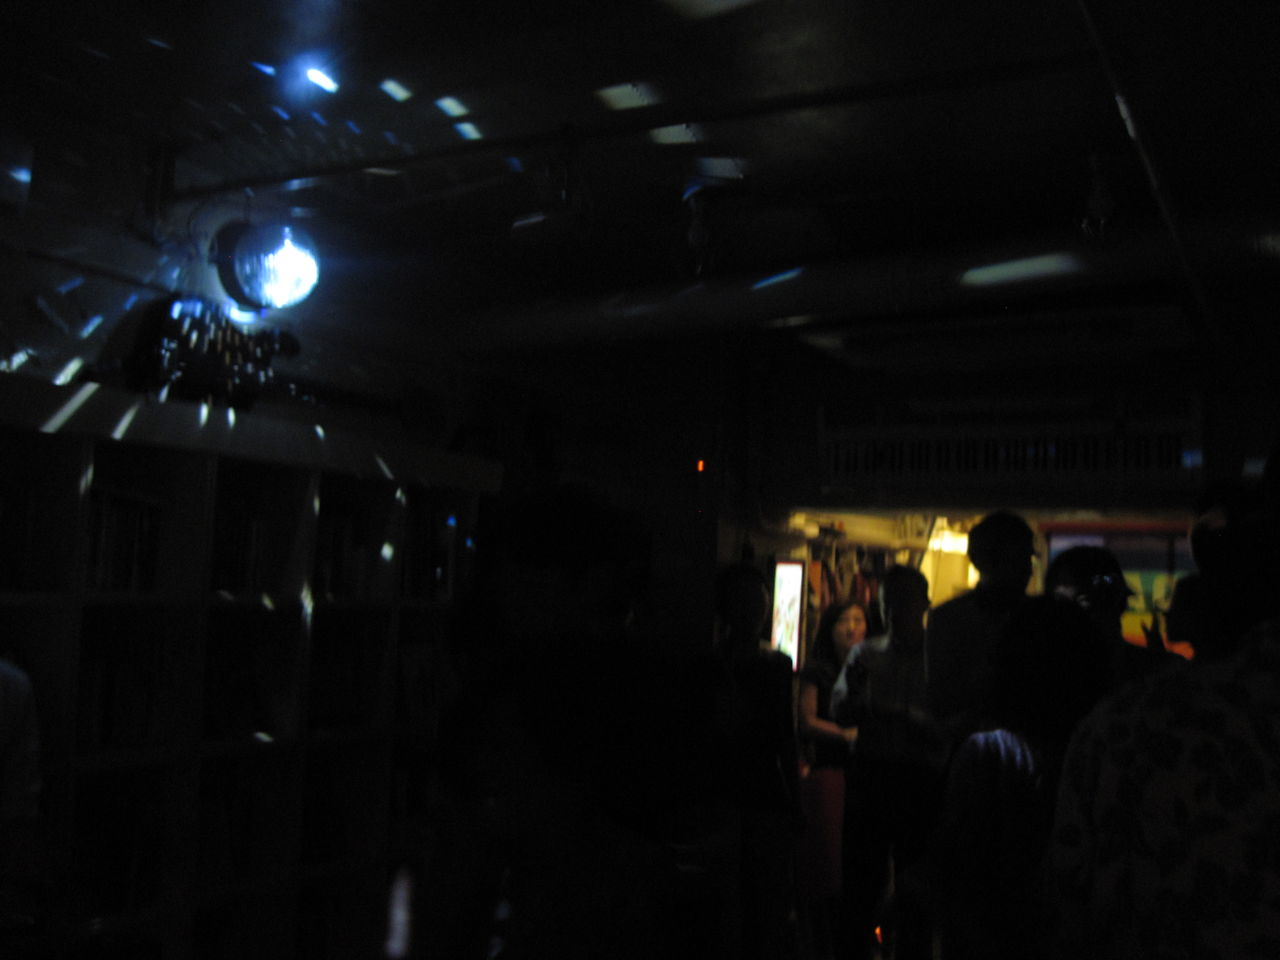 20121012LoveLaughLavanderia ミラーボール